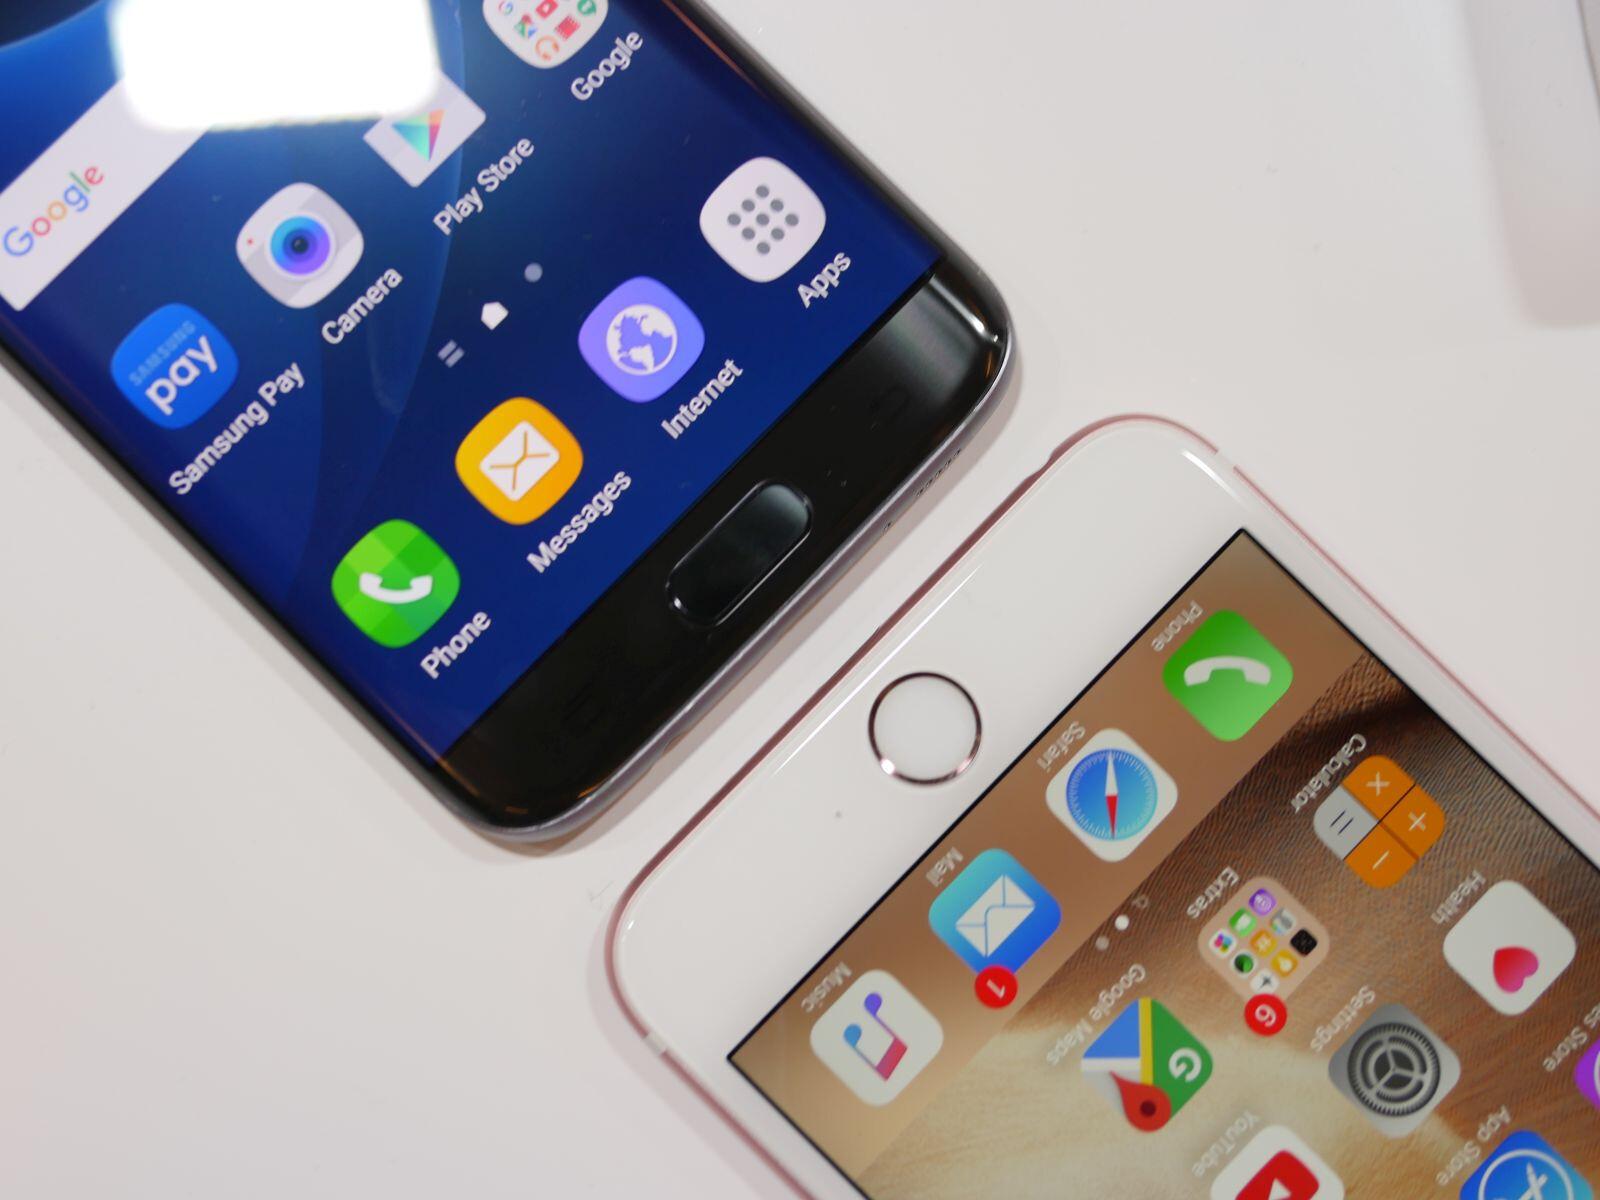 samsung galaxy s7 edge vs apple iphone 6s plus first look. Black Bedroom Furniture Sets. Home Design Ideas